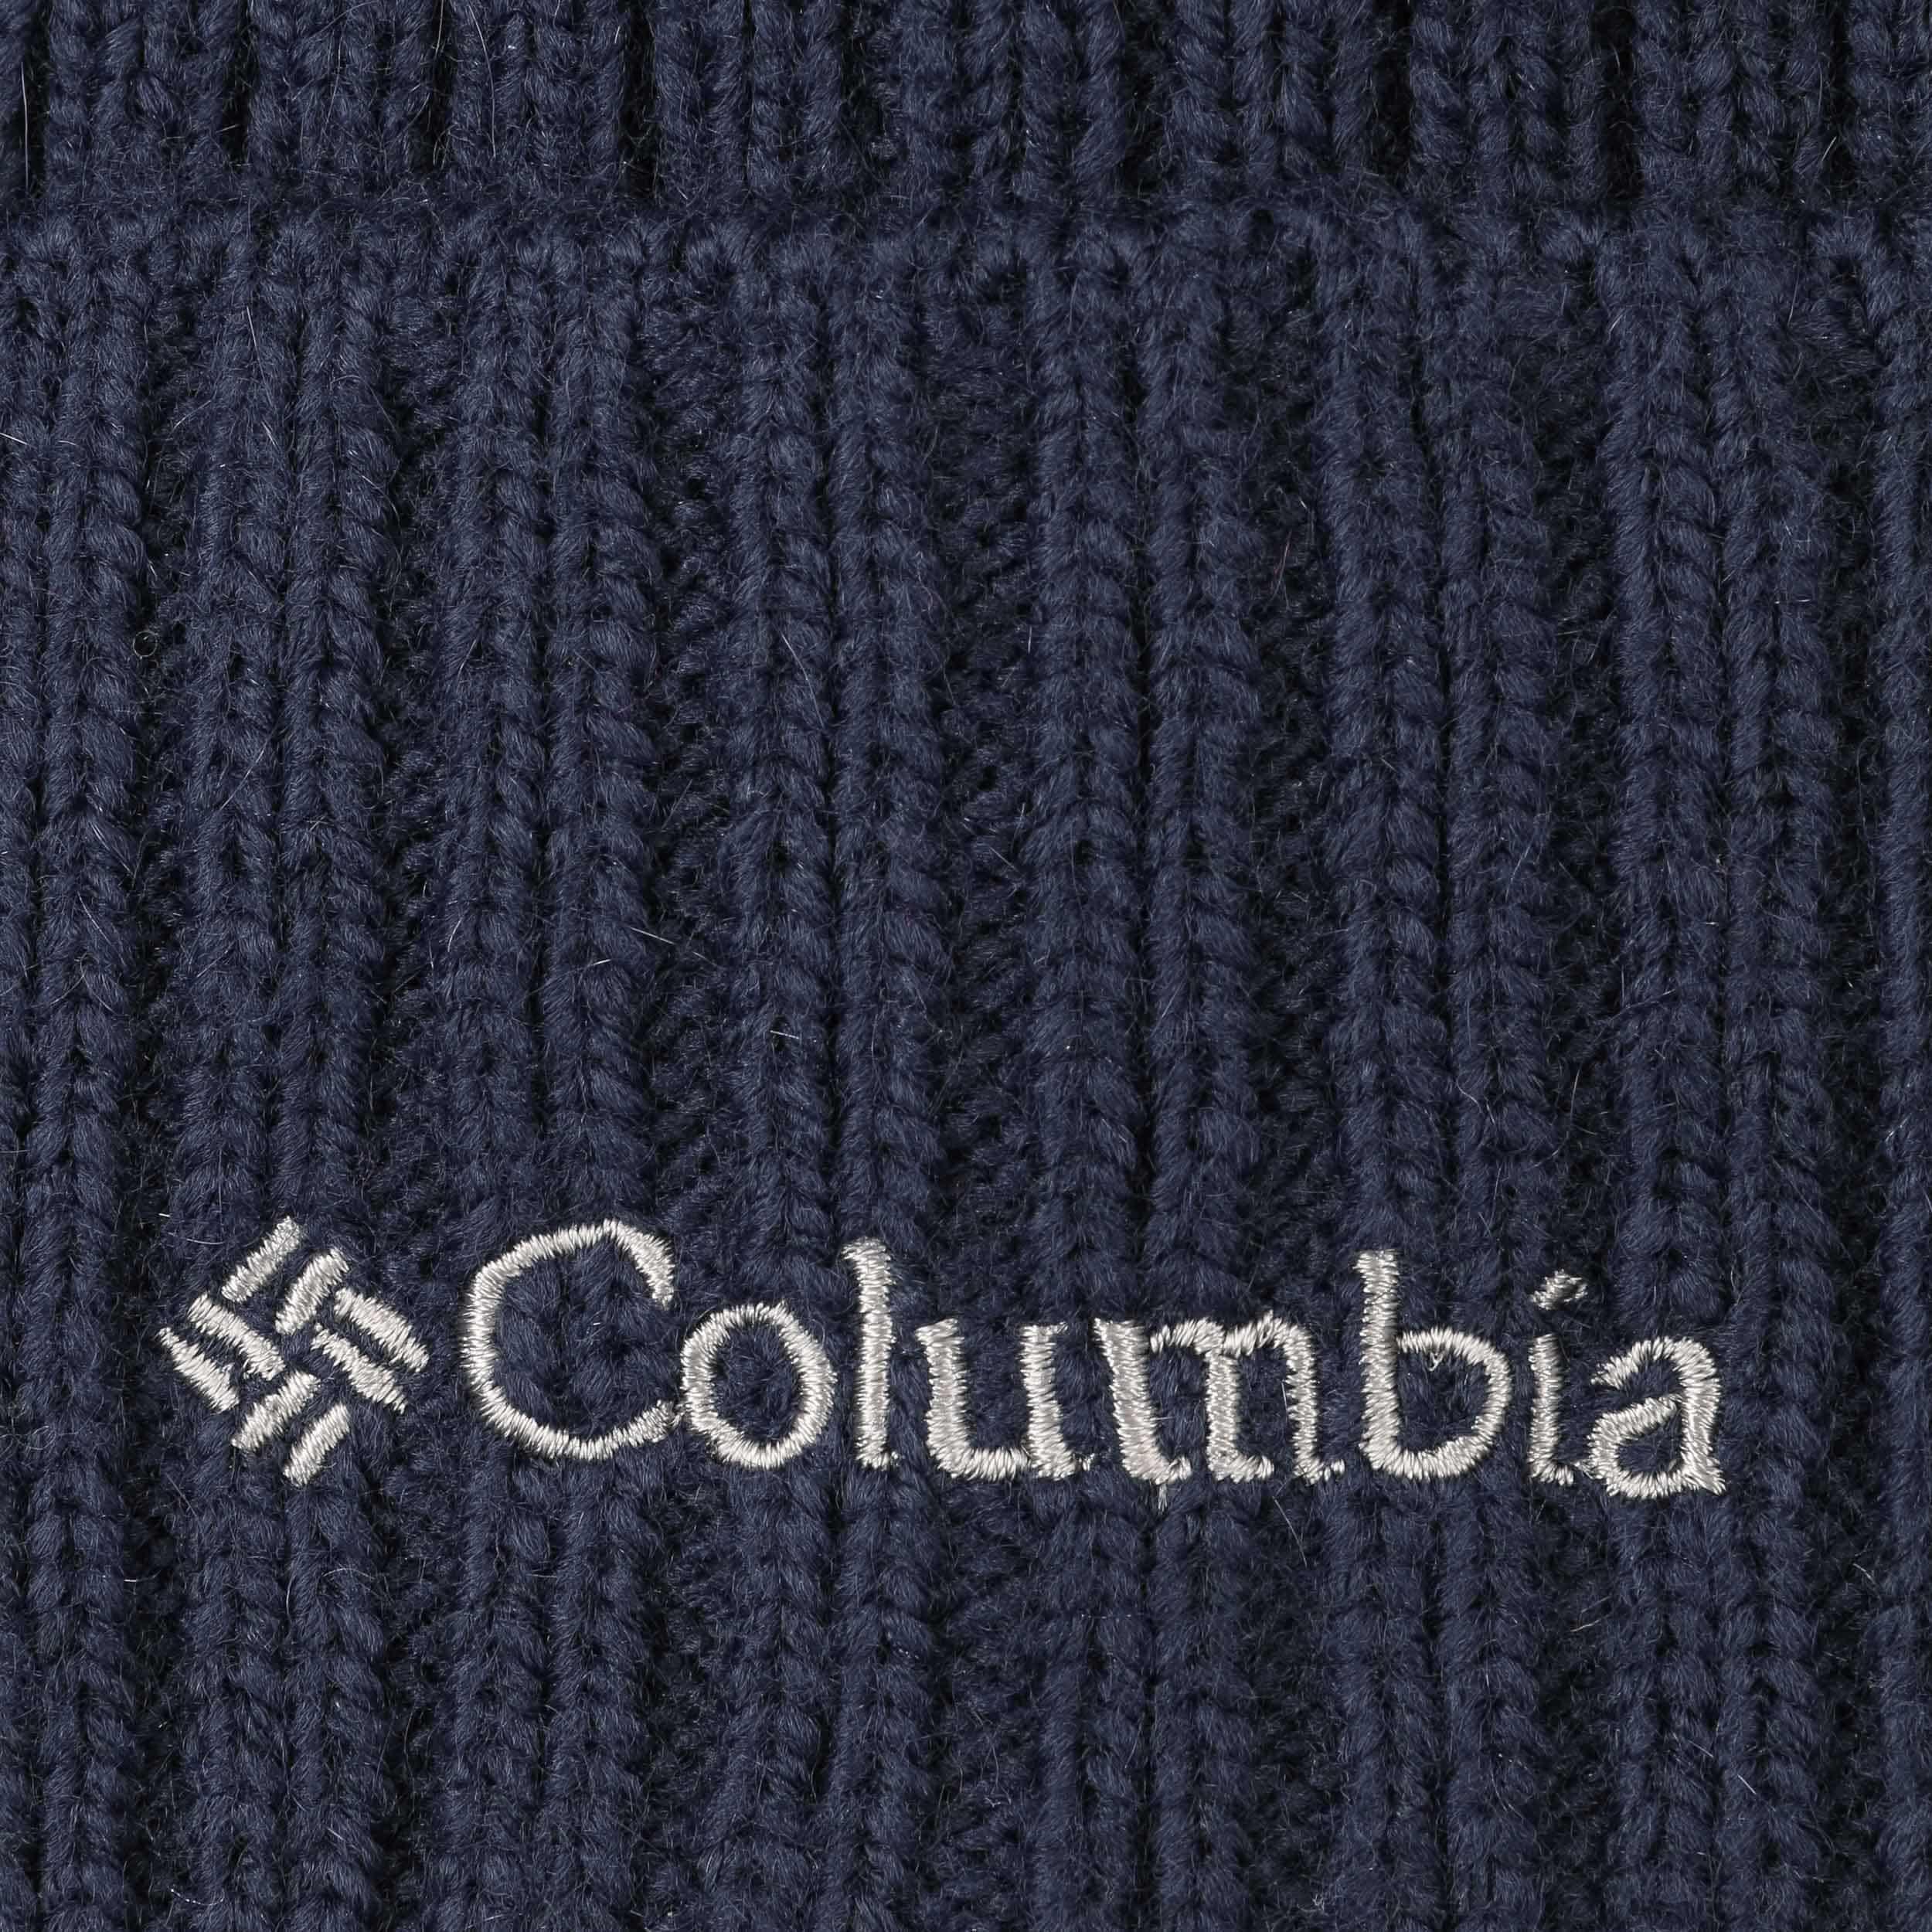 ... Watch Cap II Beanie by Columbia - navy 2 ... 85b132ddf0ed